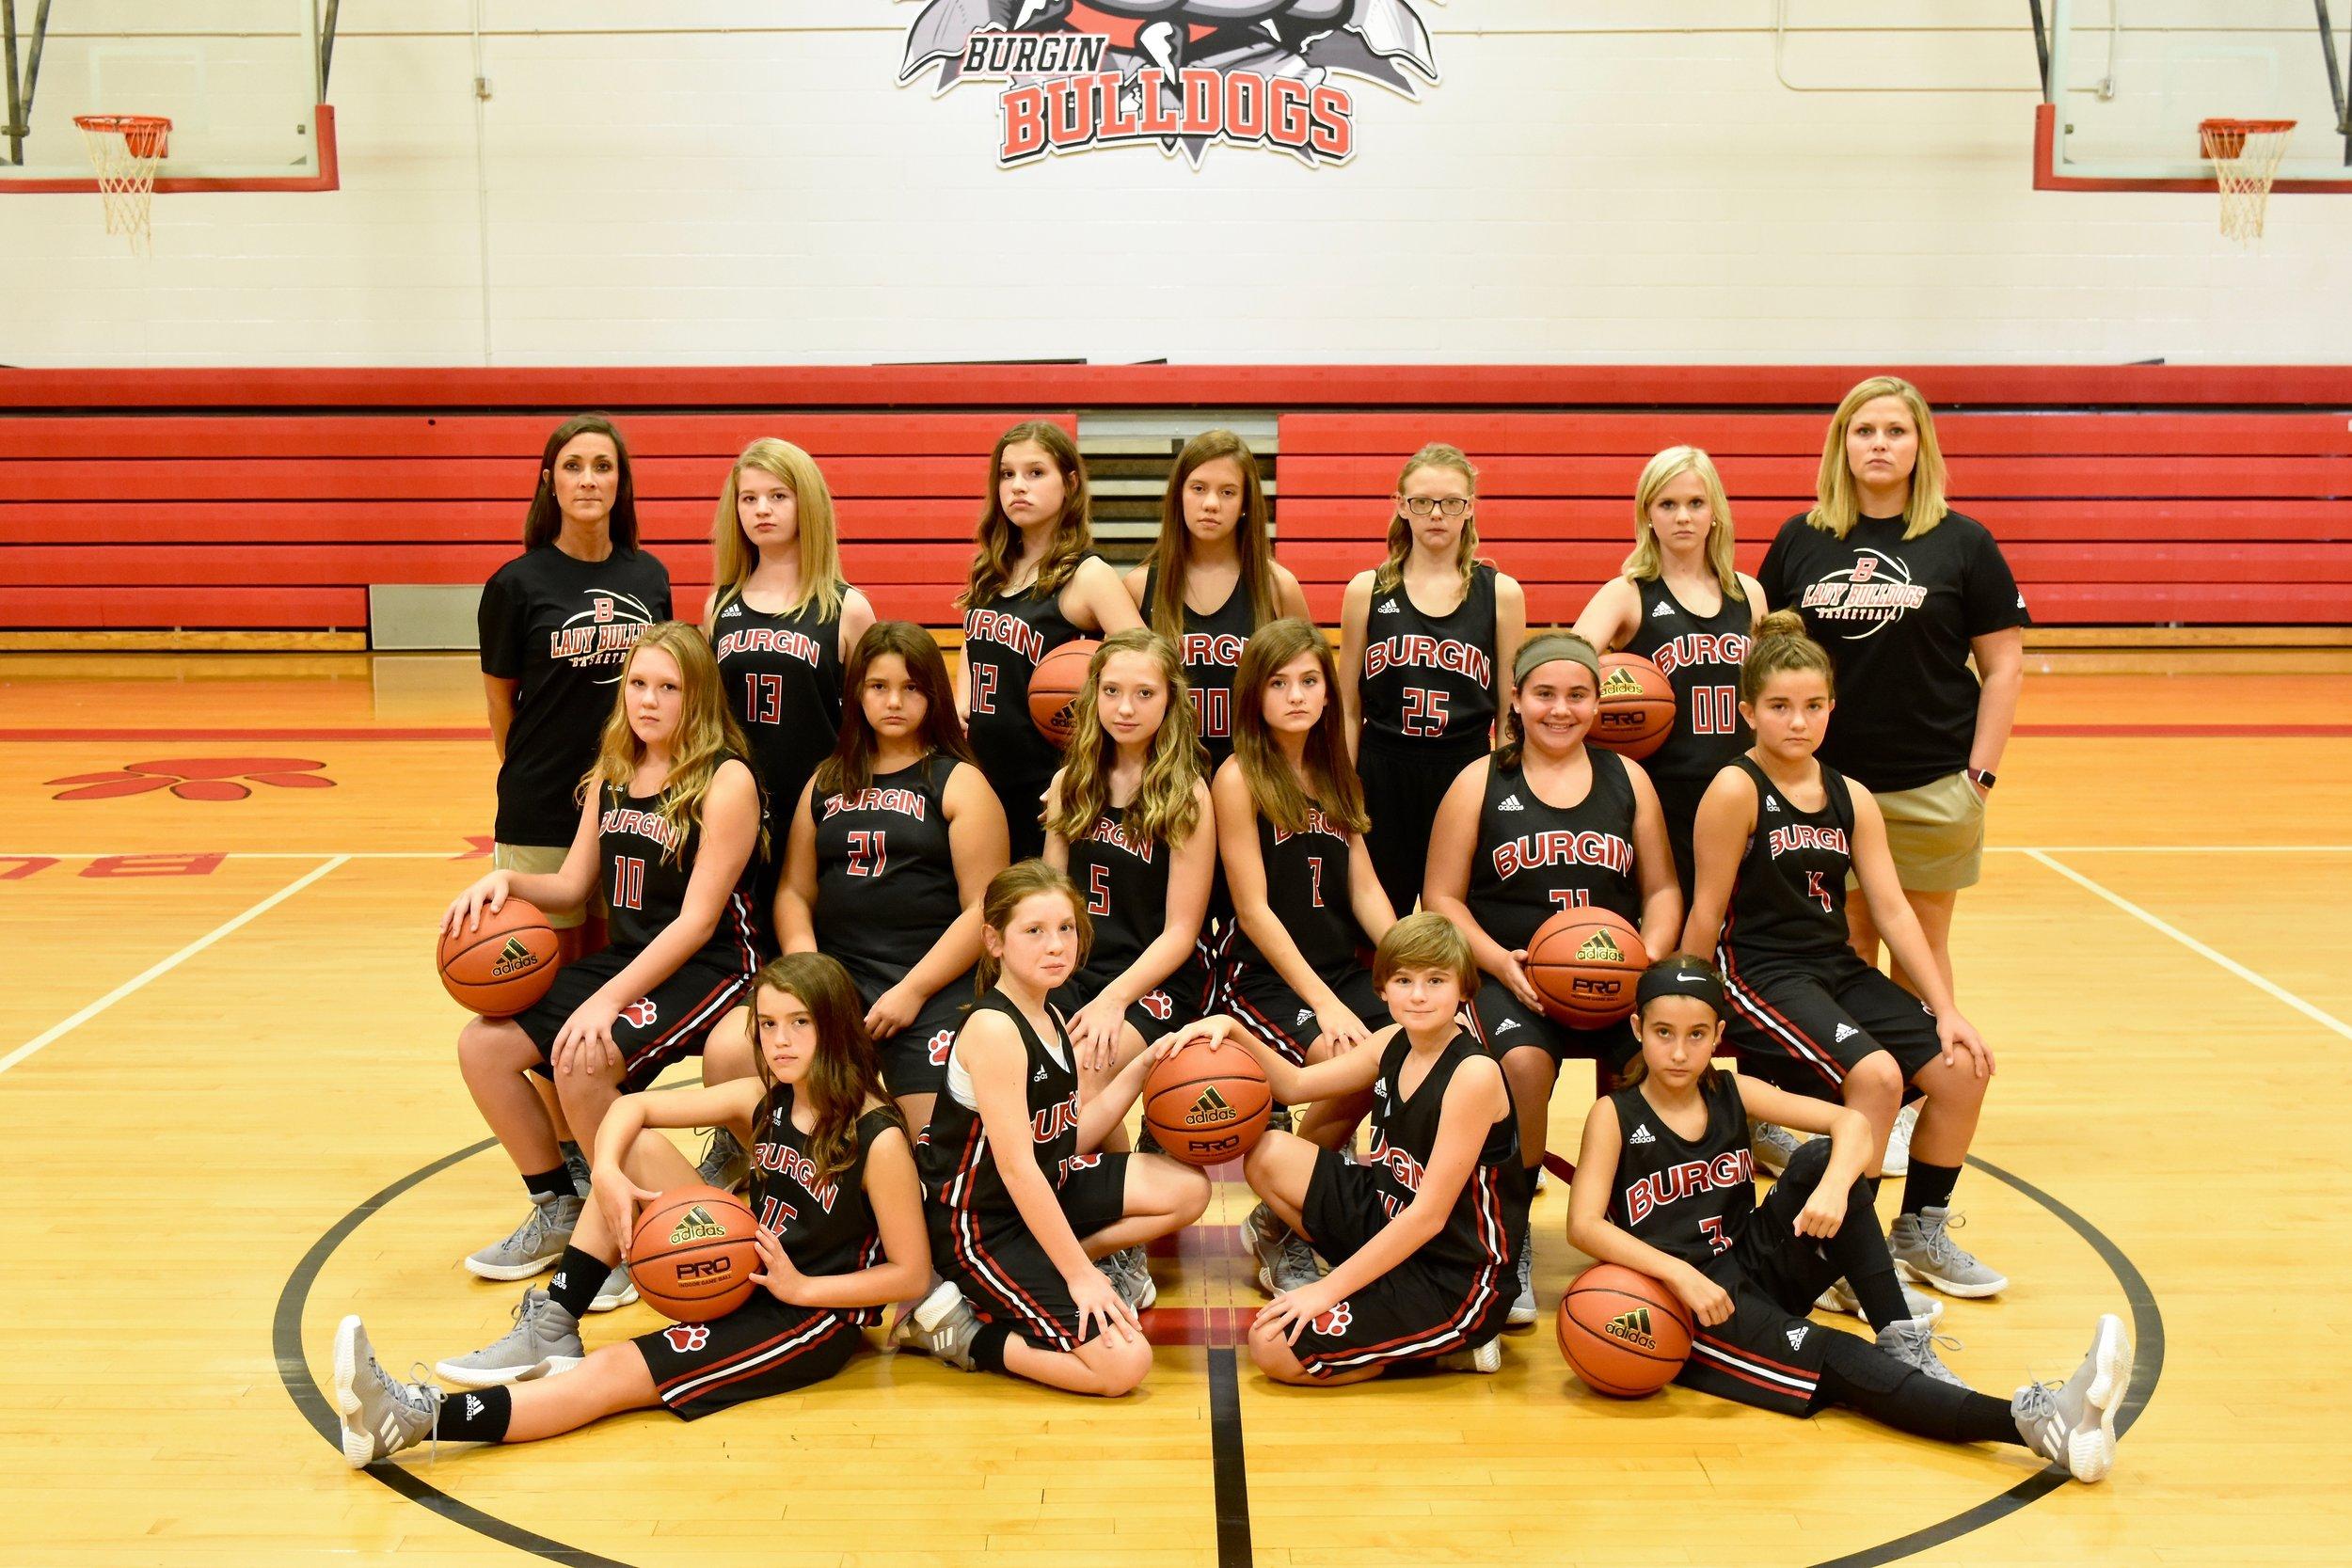 Middle School Girls Basketball Team - Fall 2018